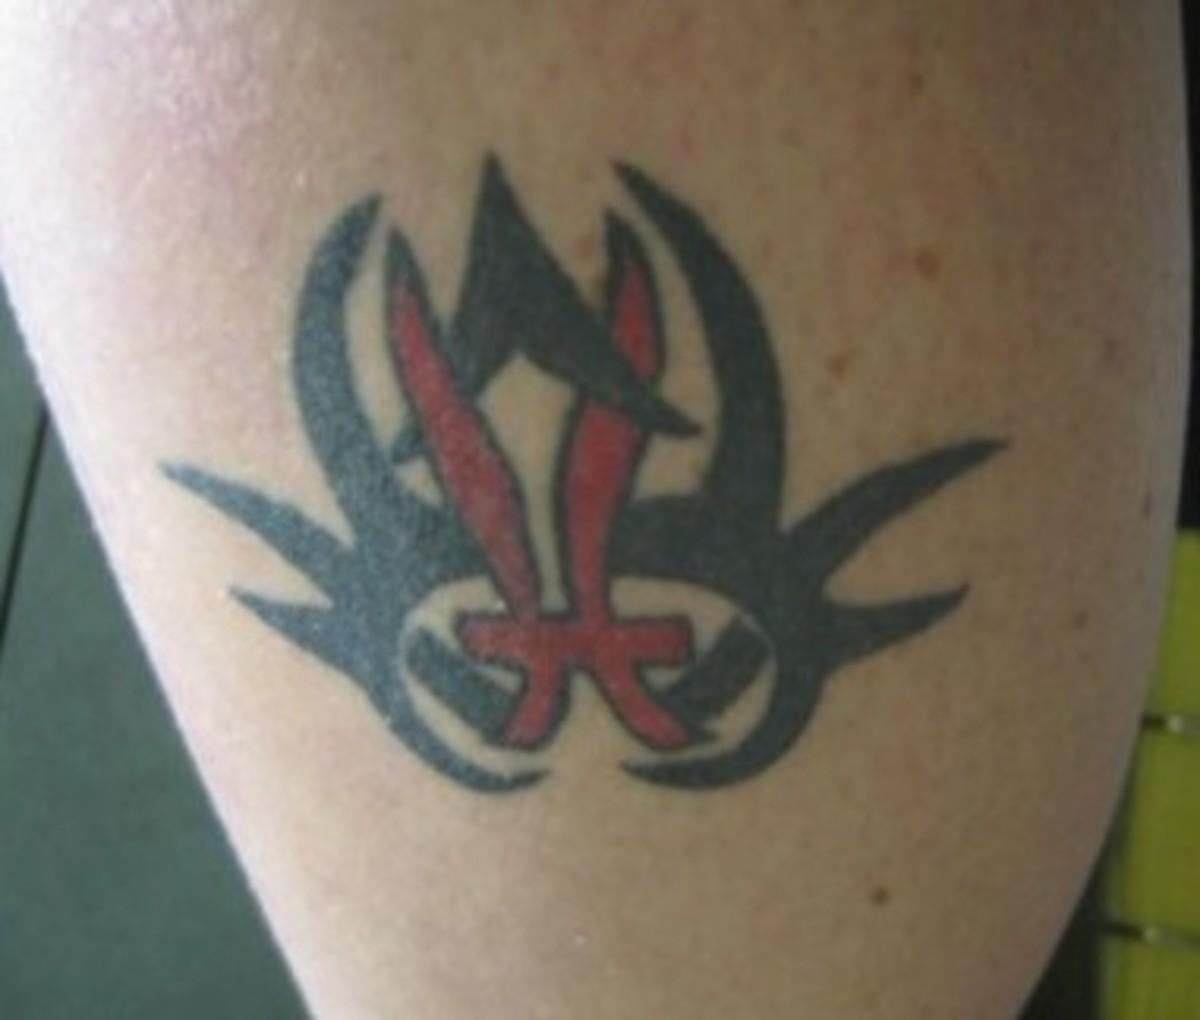 idei-dlya-tatuirovok - Идеи Татуировки: Знаки Зодиака -- Рыбы -  - фото